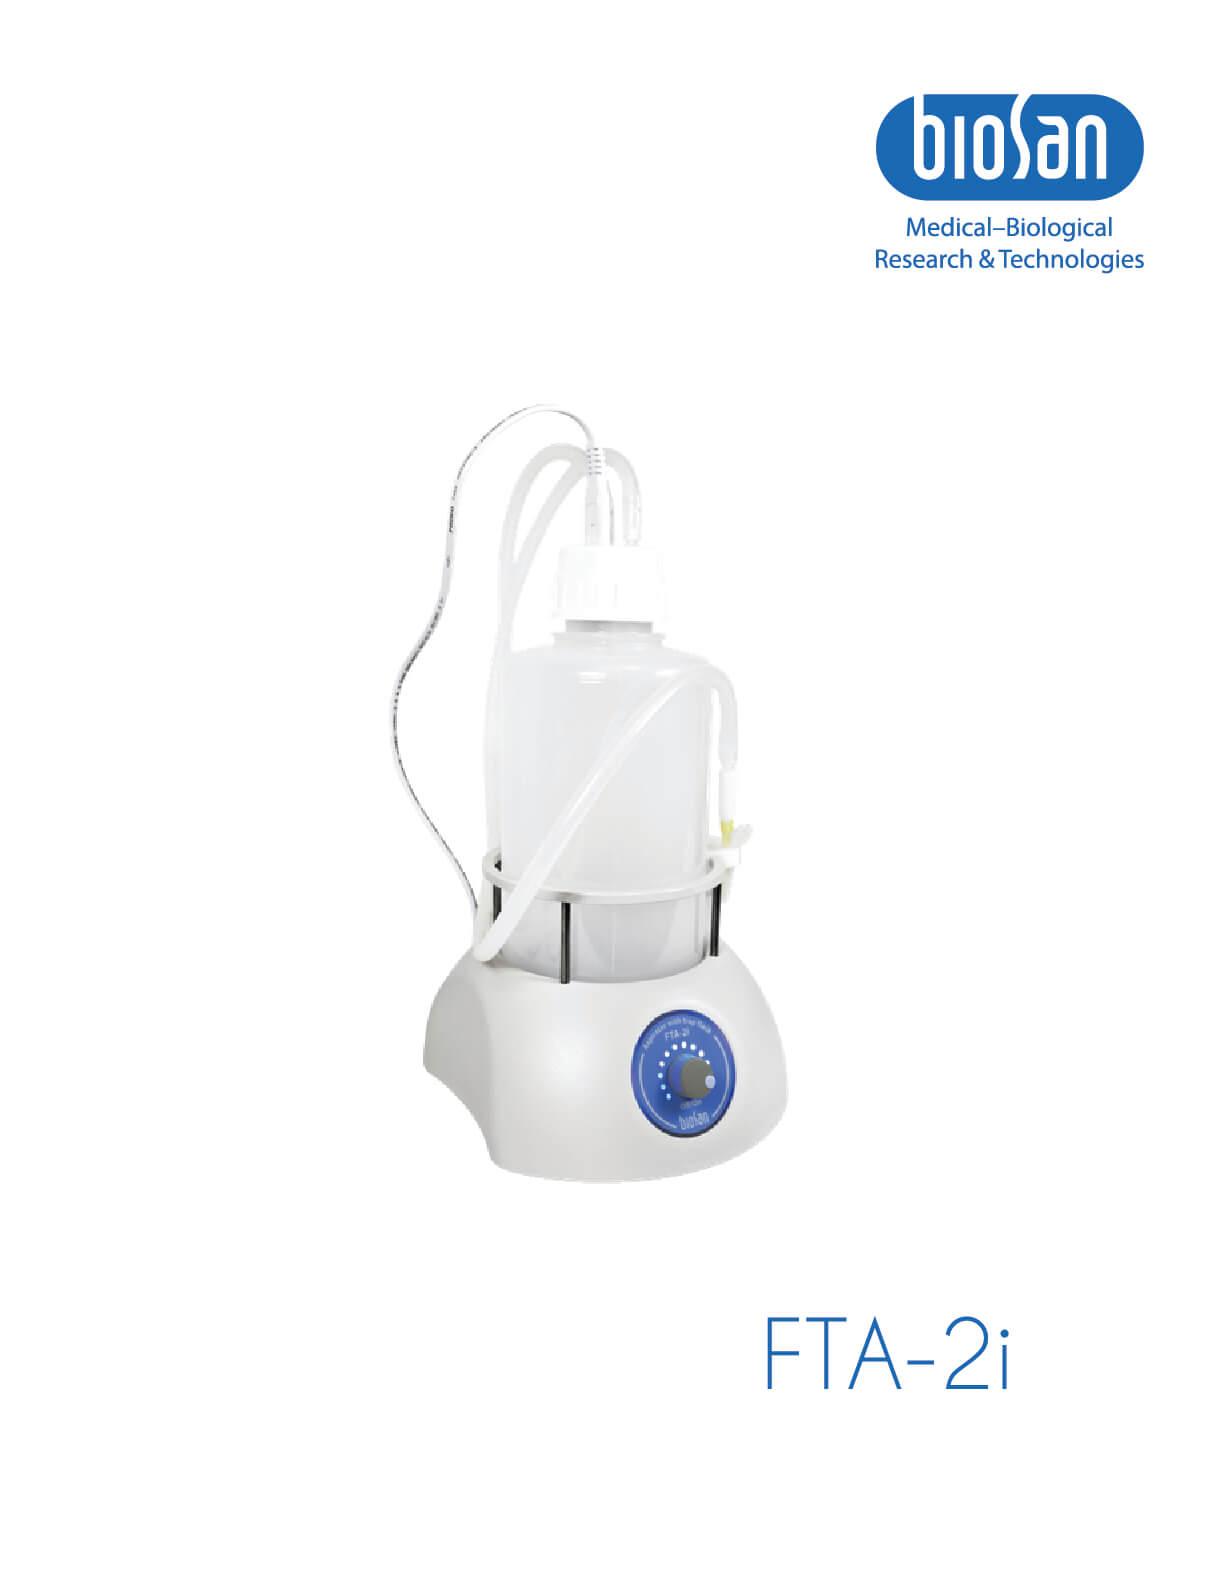 FTA-2i, Aspirator with Trap Flask